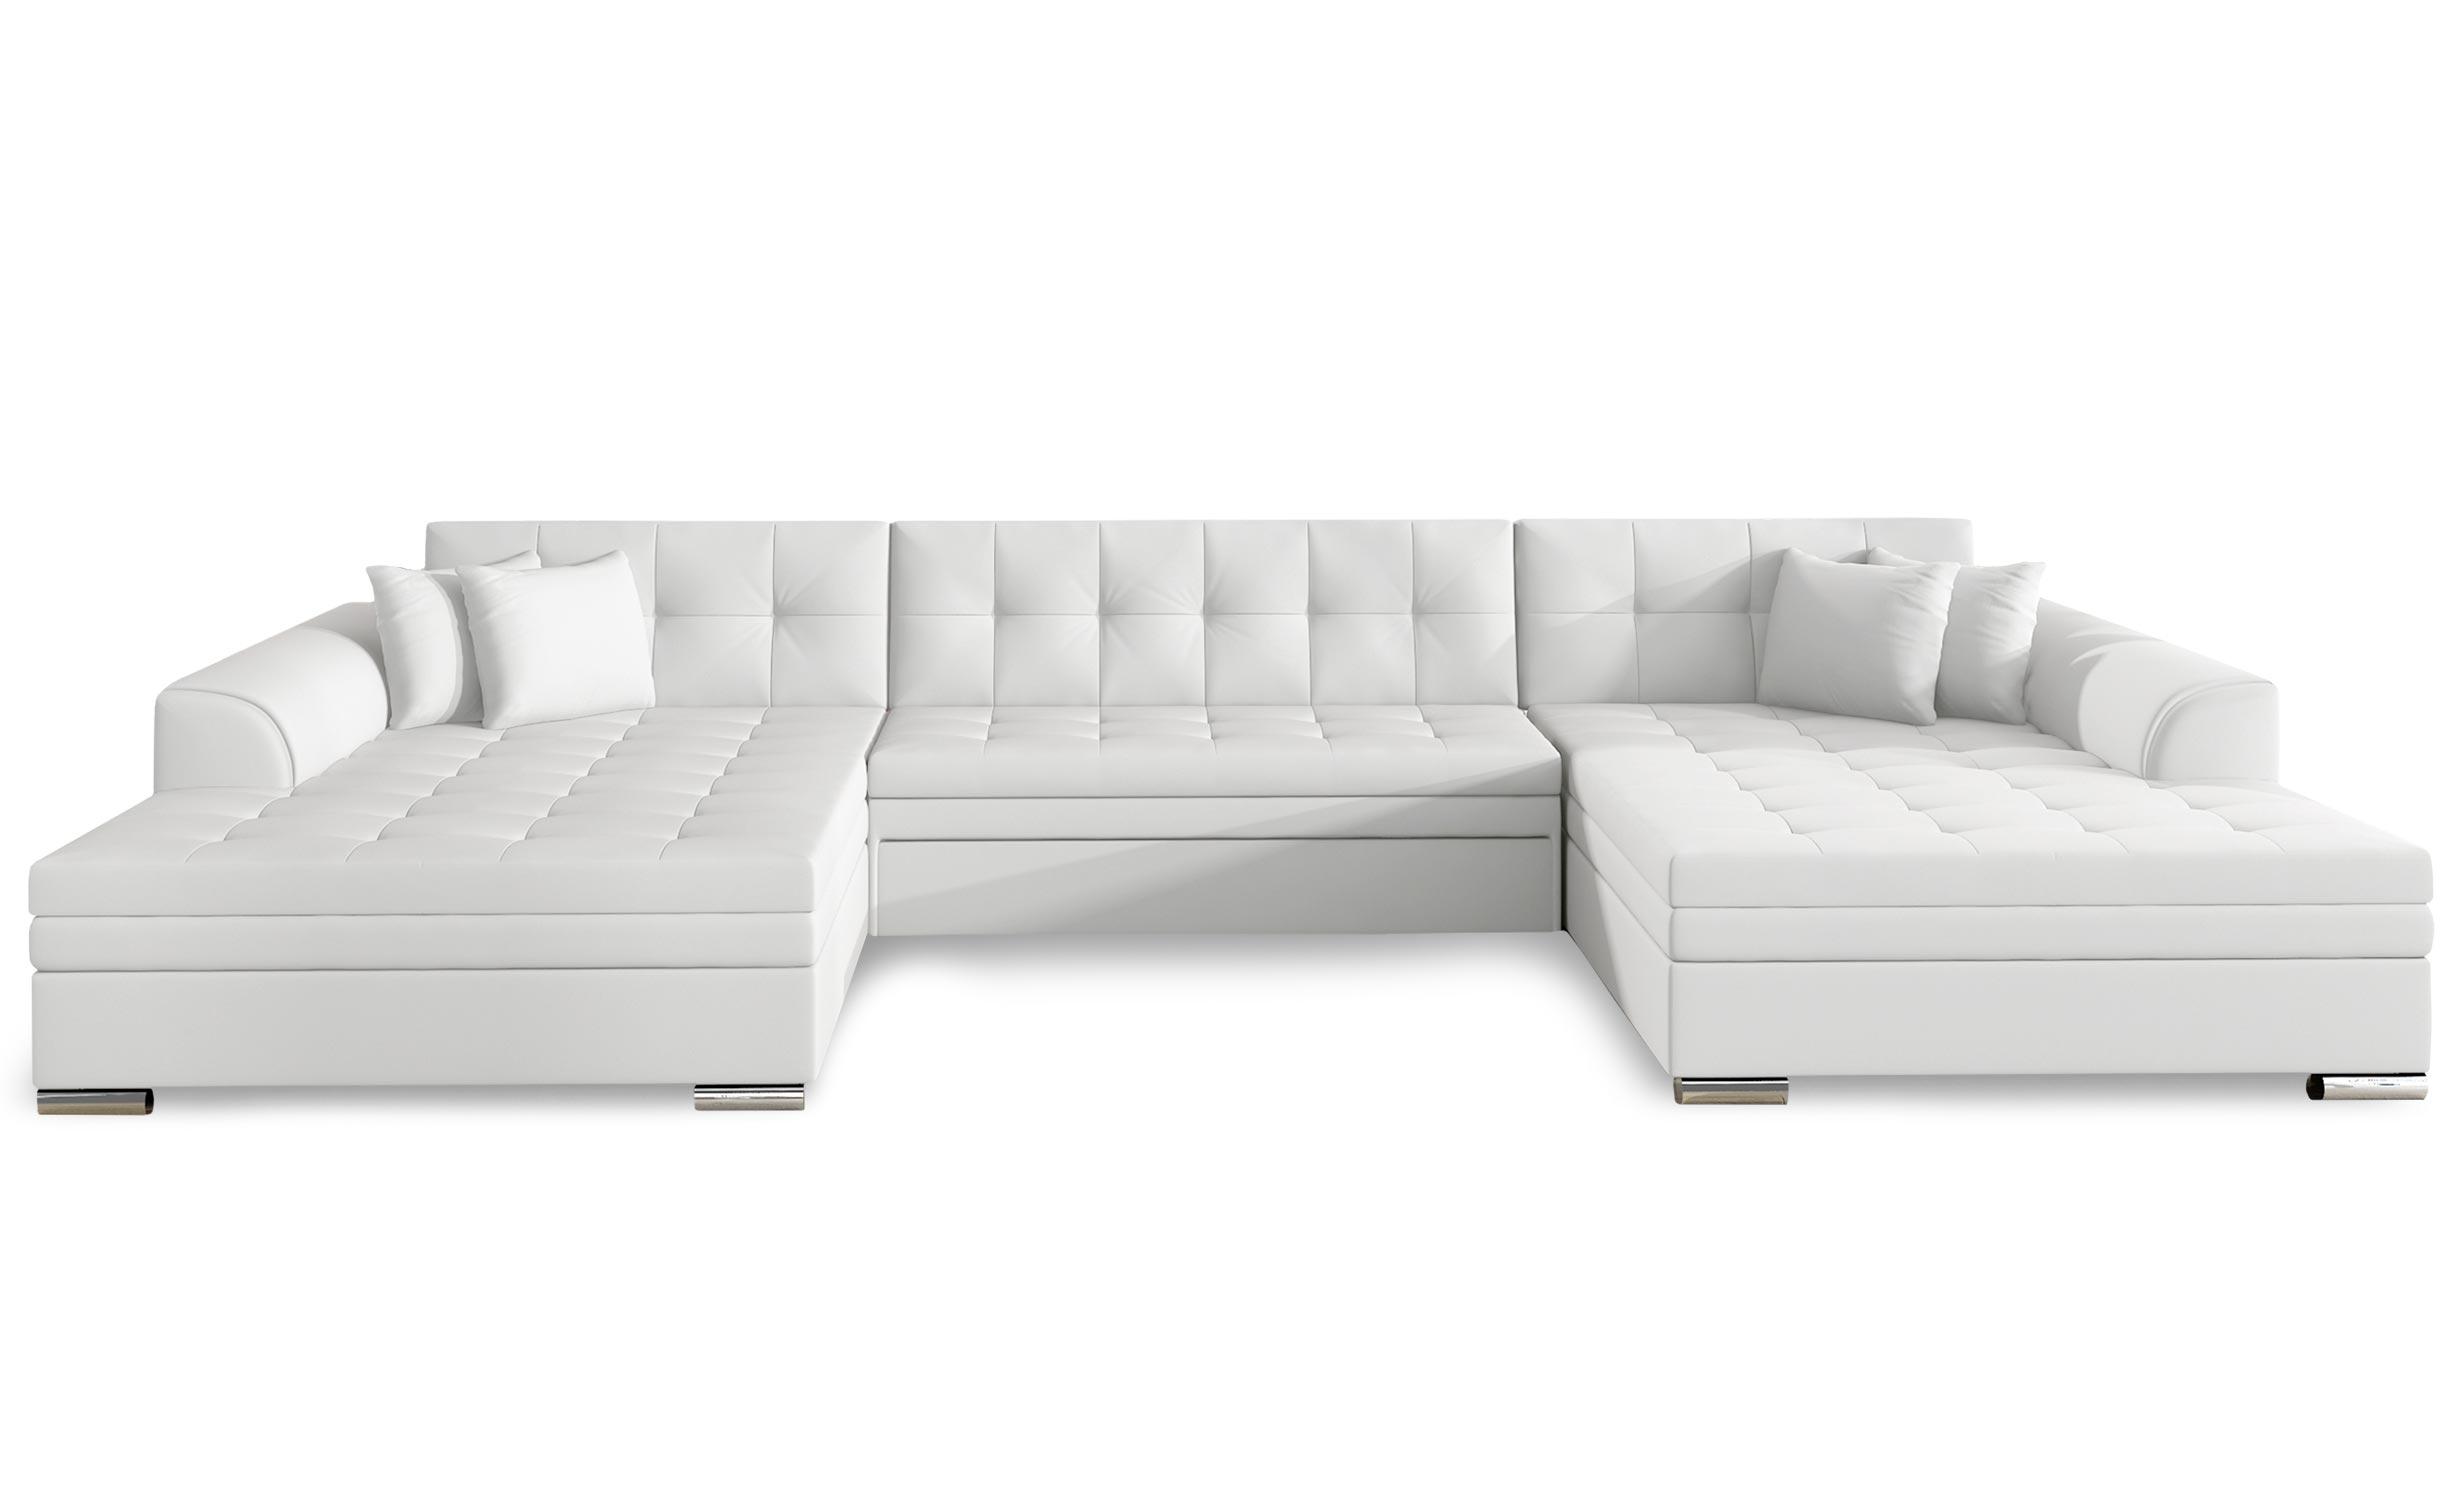 Canapé d'angle convertible Vento Simili Blanc